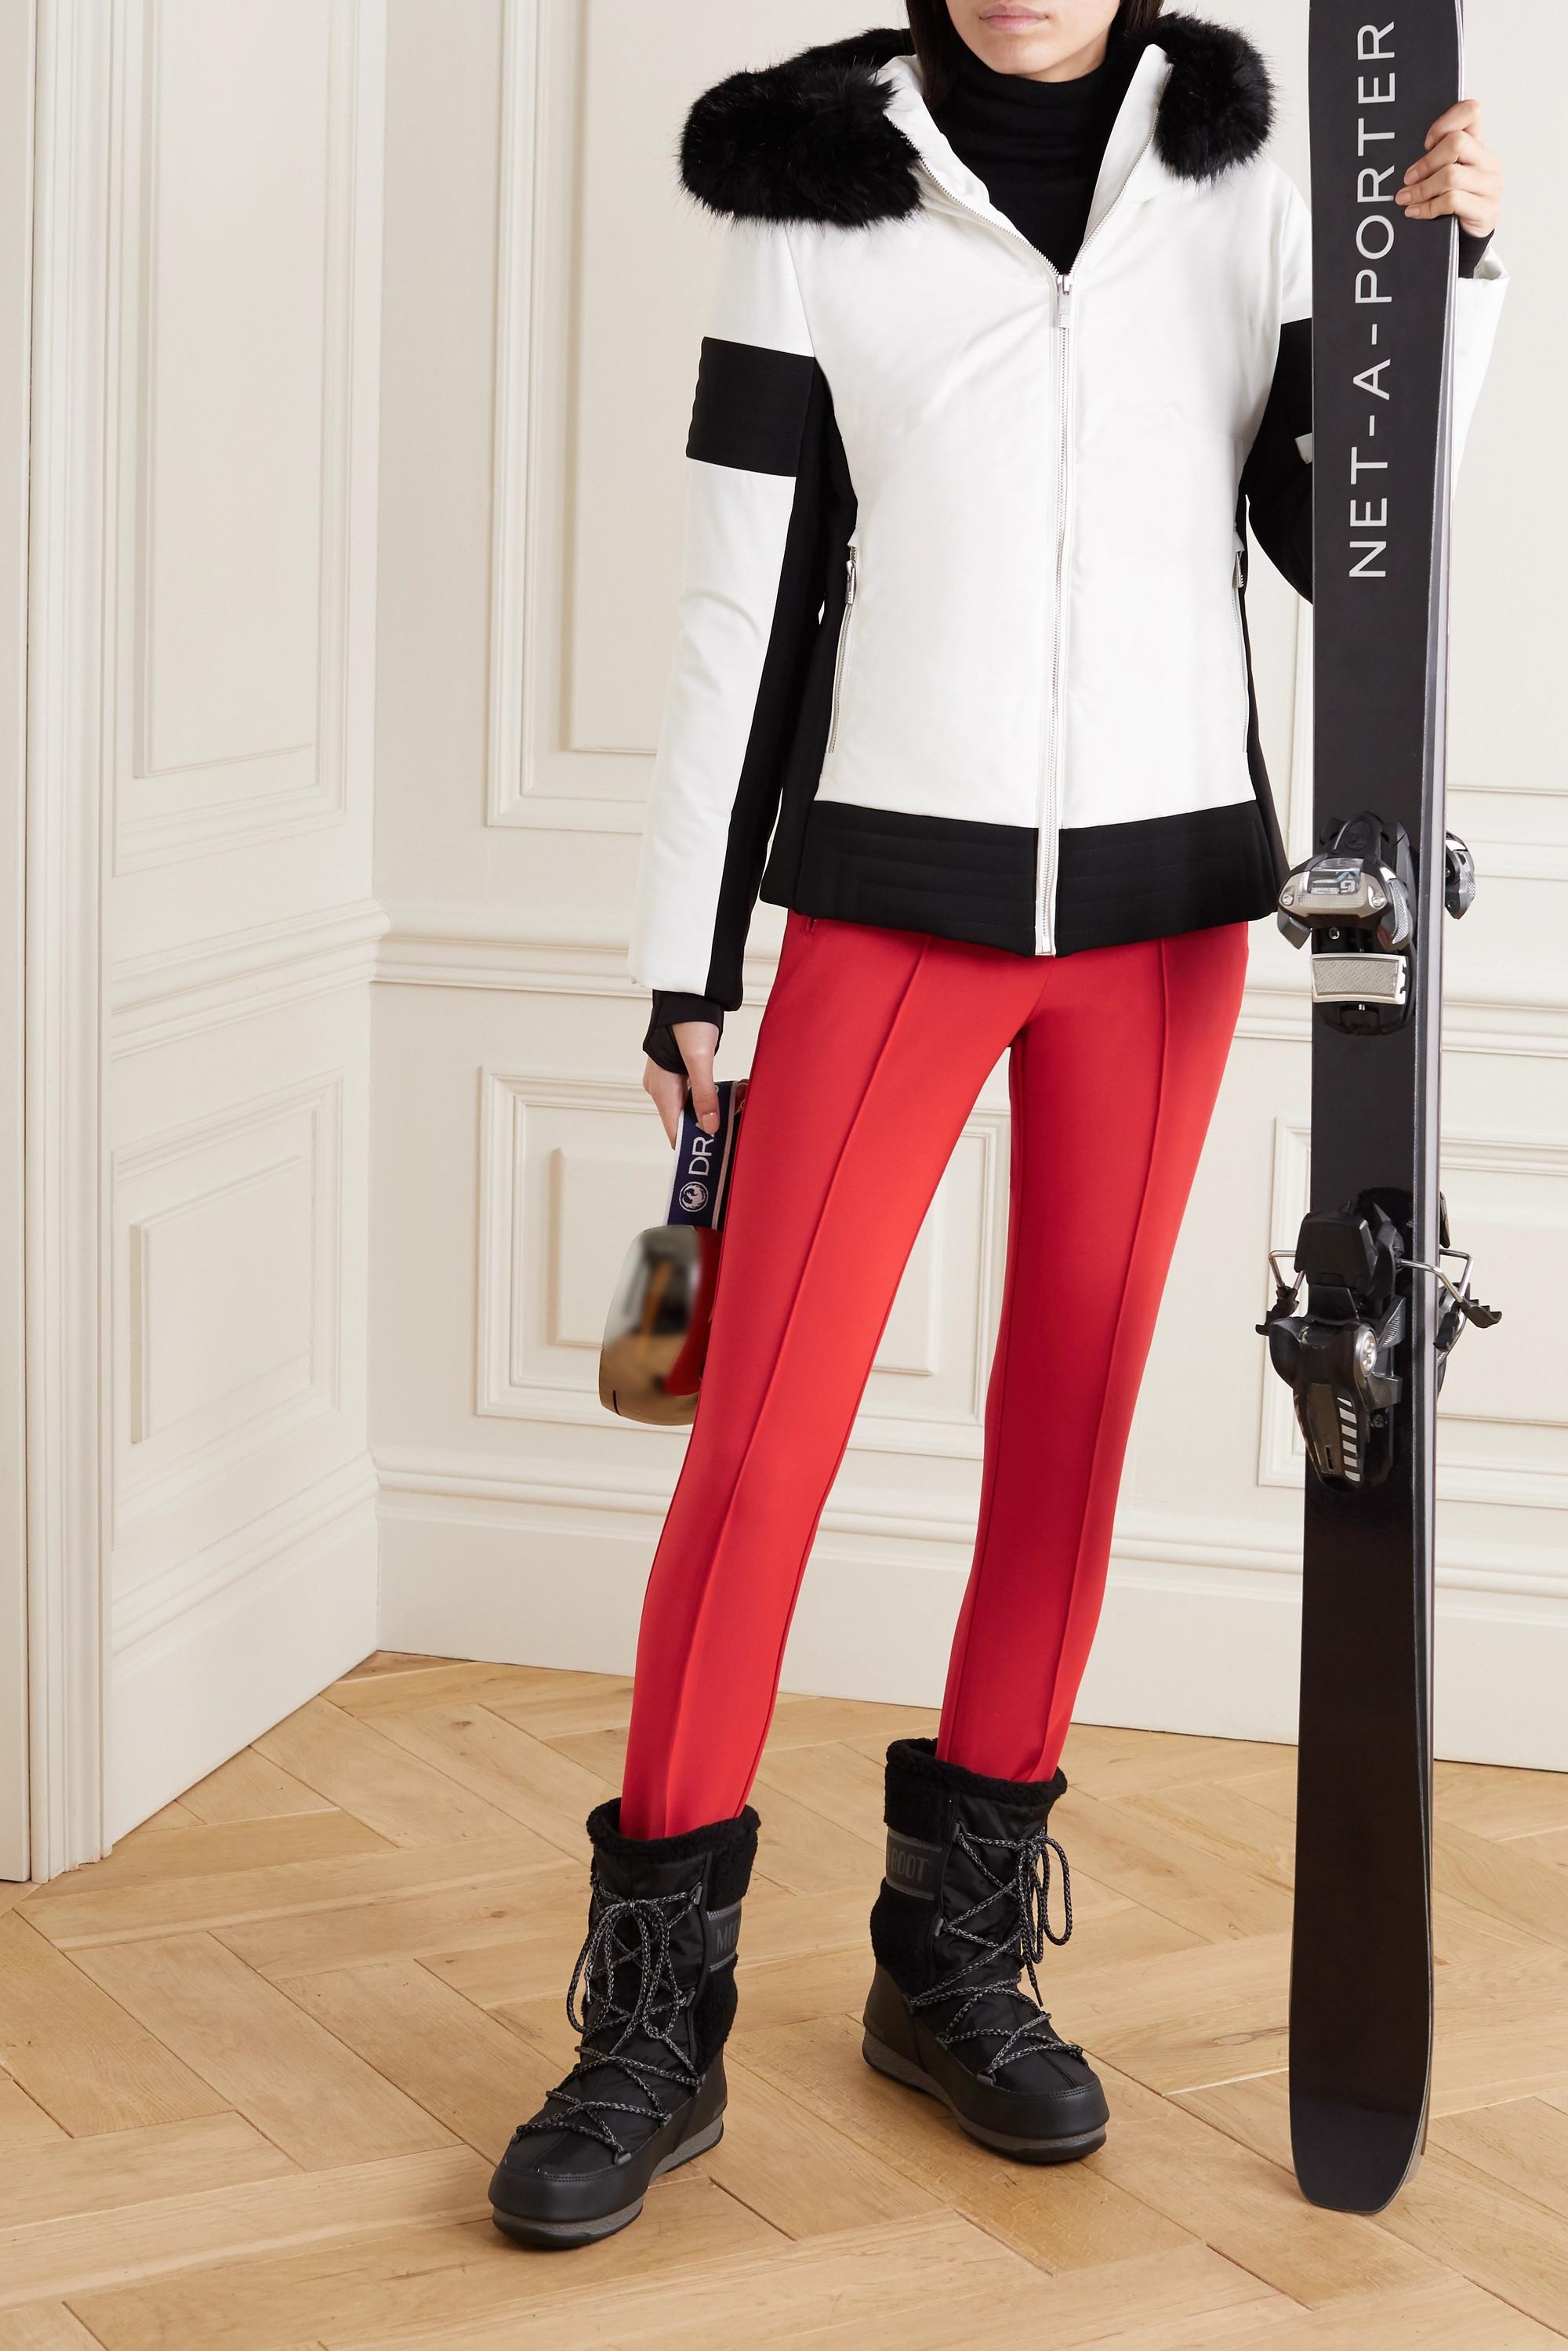 Fusalp Fuzz stirrup ski pants